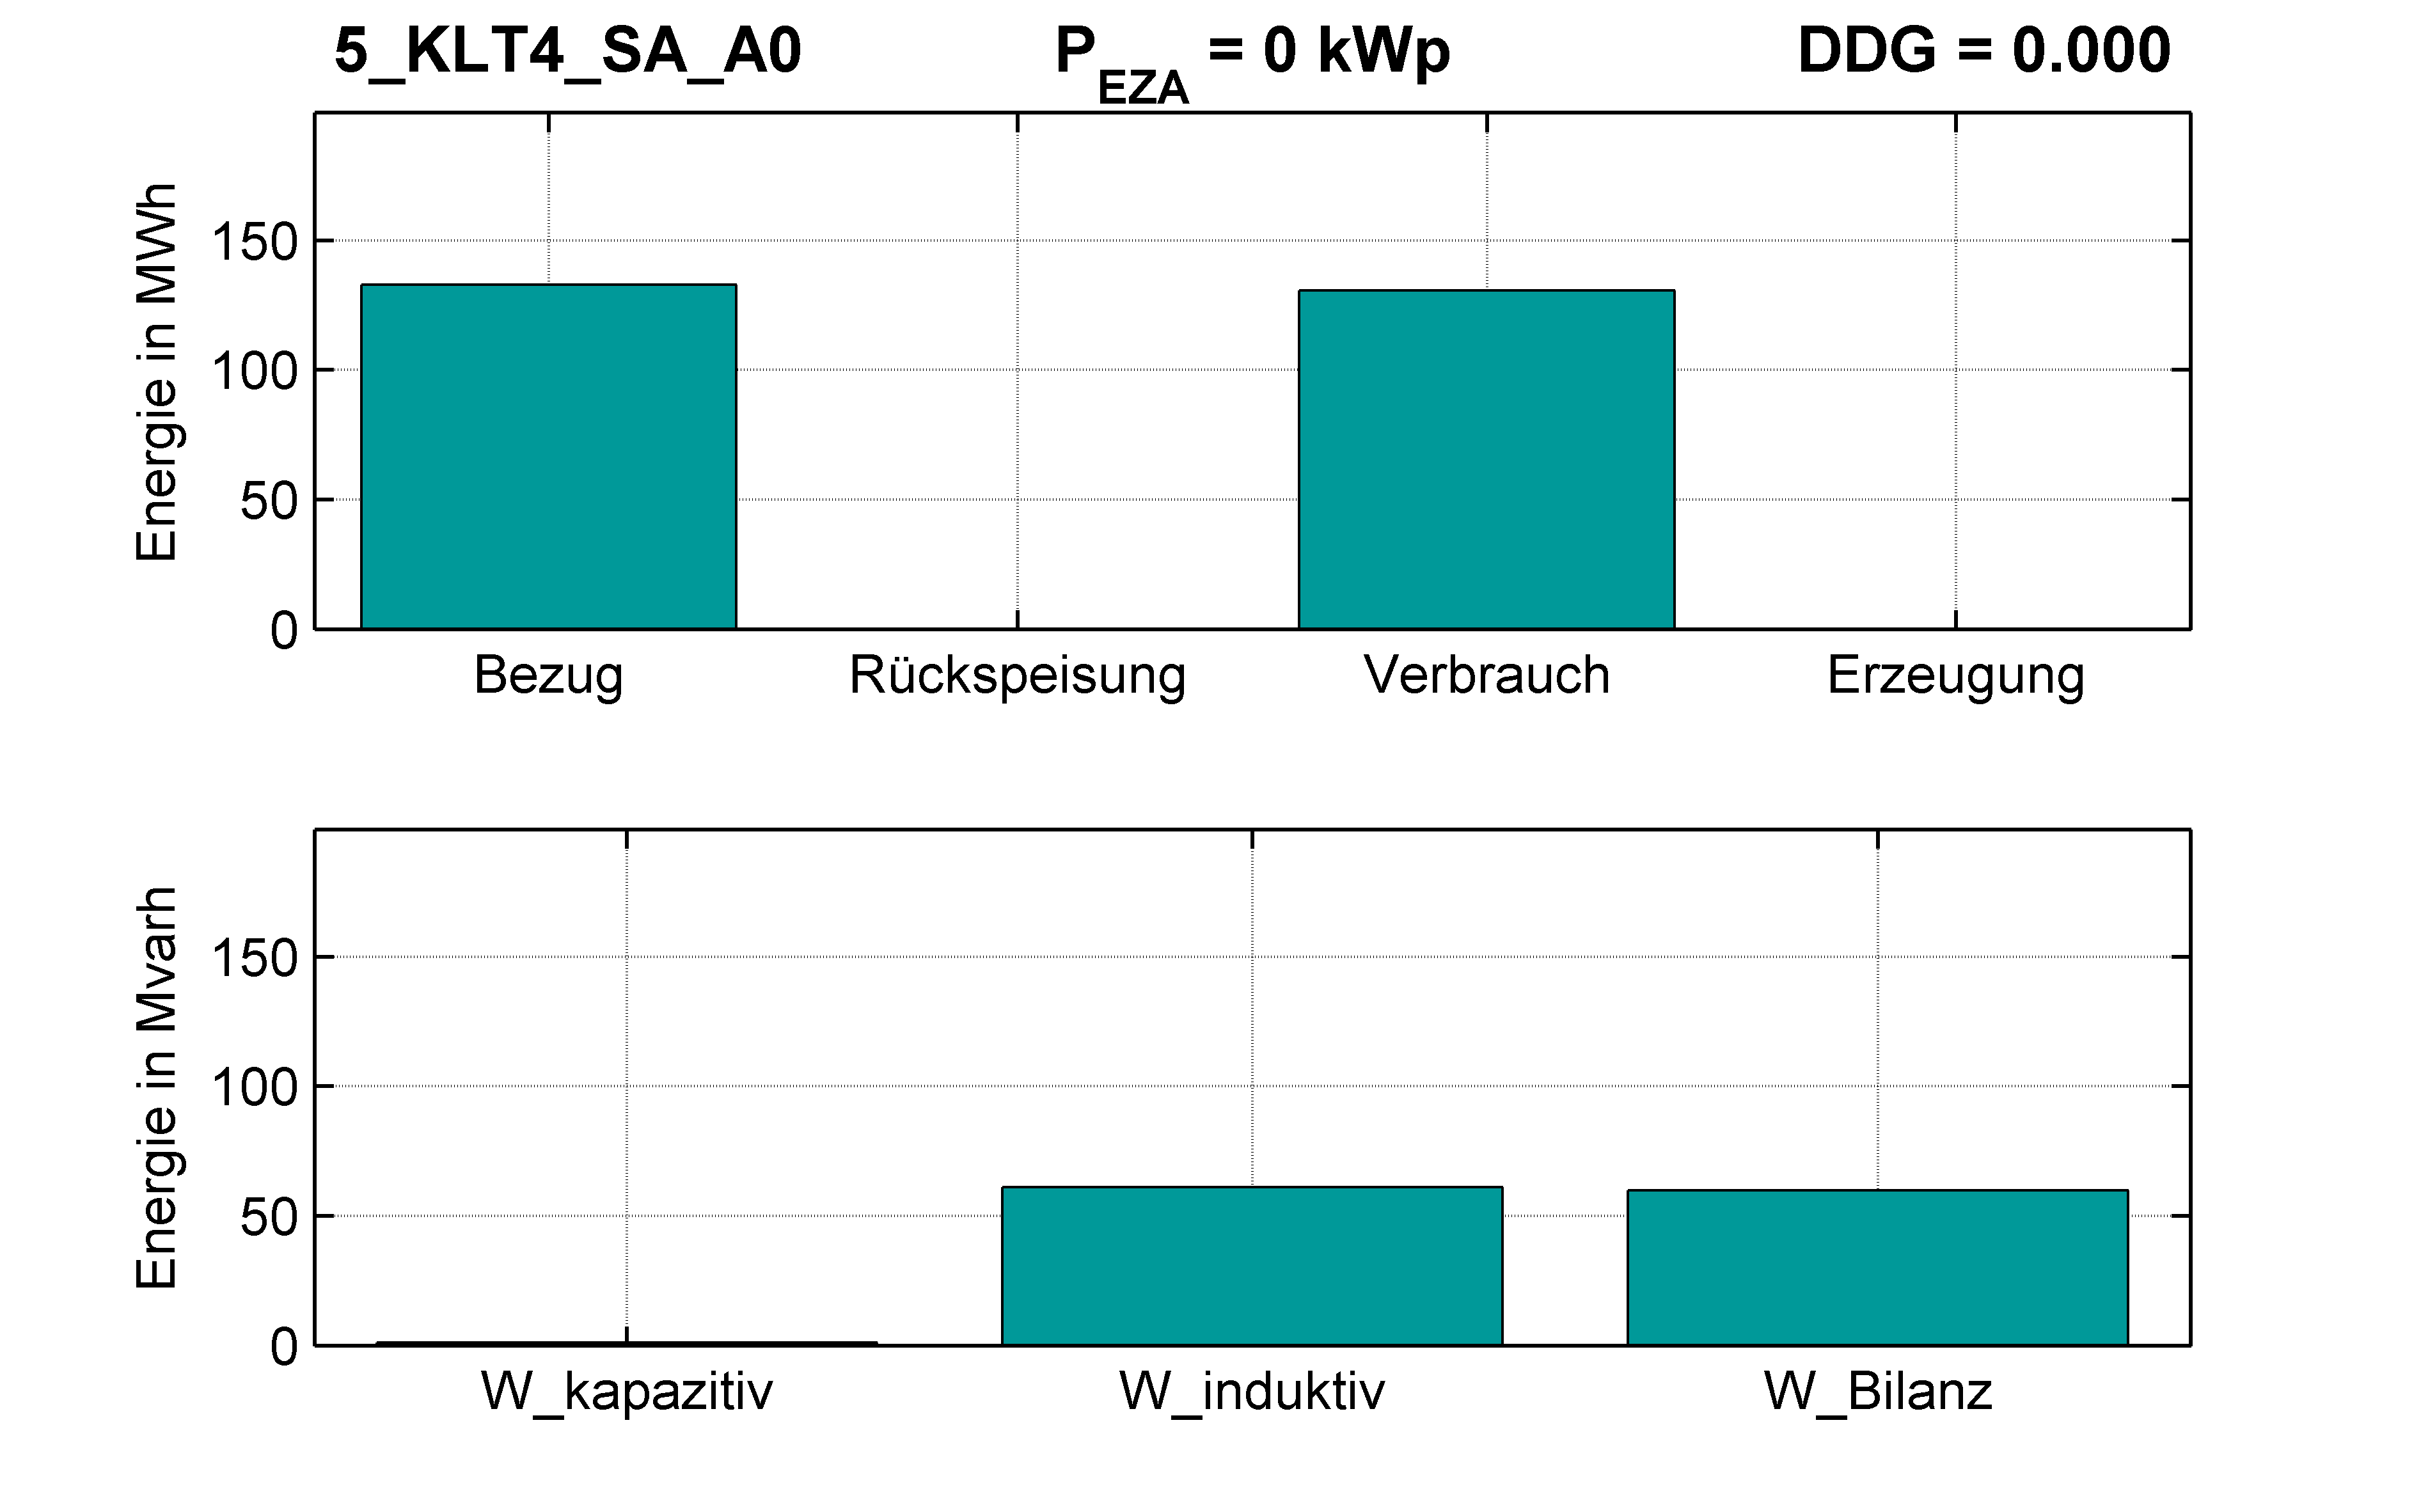 KLT4 | STATION (SA) A0 | PQ-Bilanz